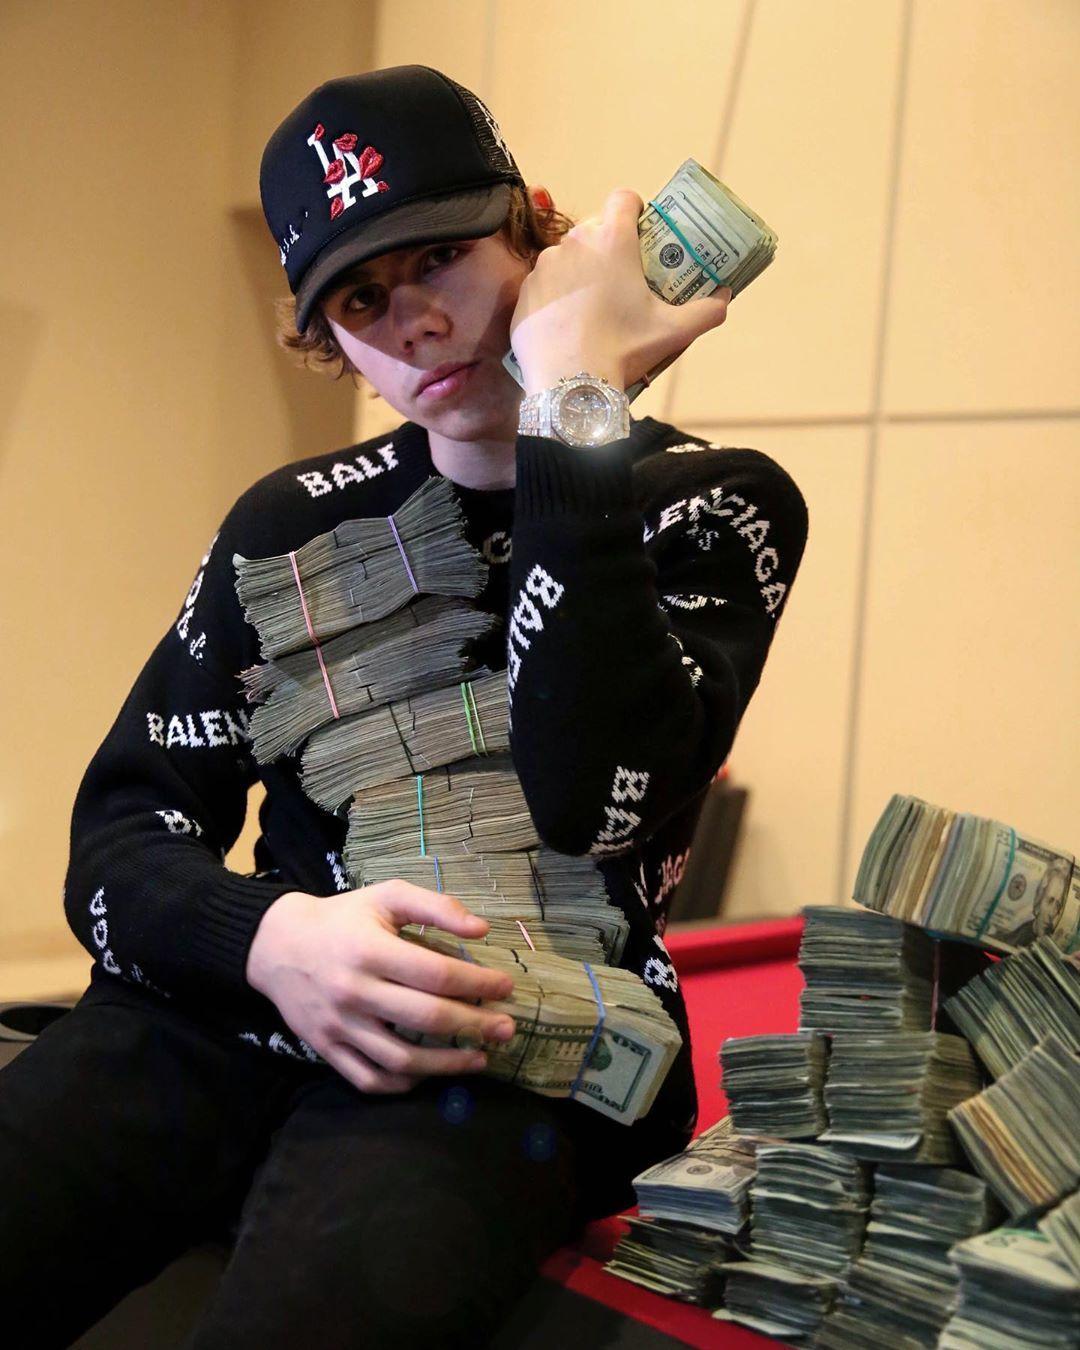 Thekidlaroi instagram bro told me always put money over